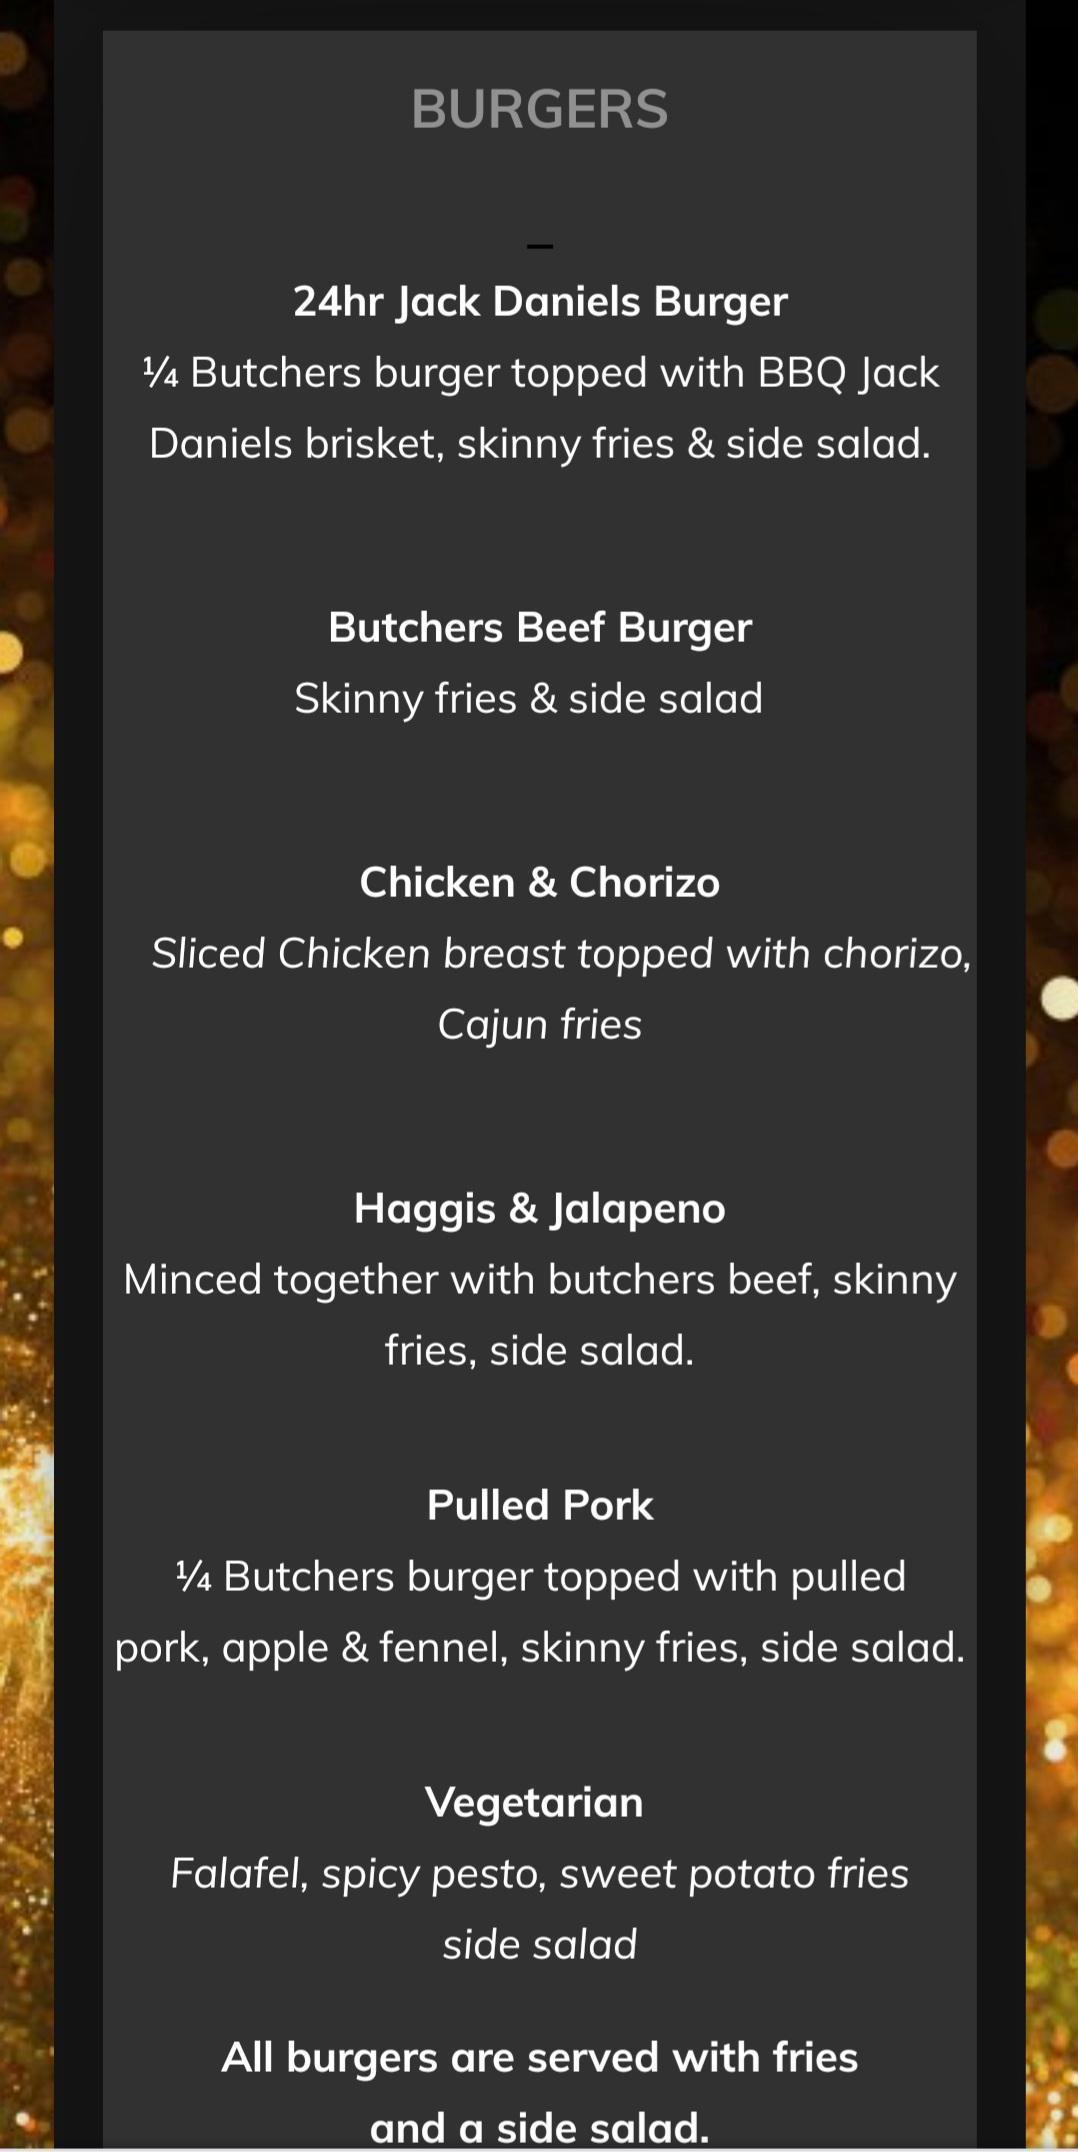 Butchers Steak & Grill